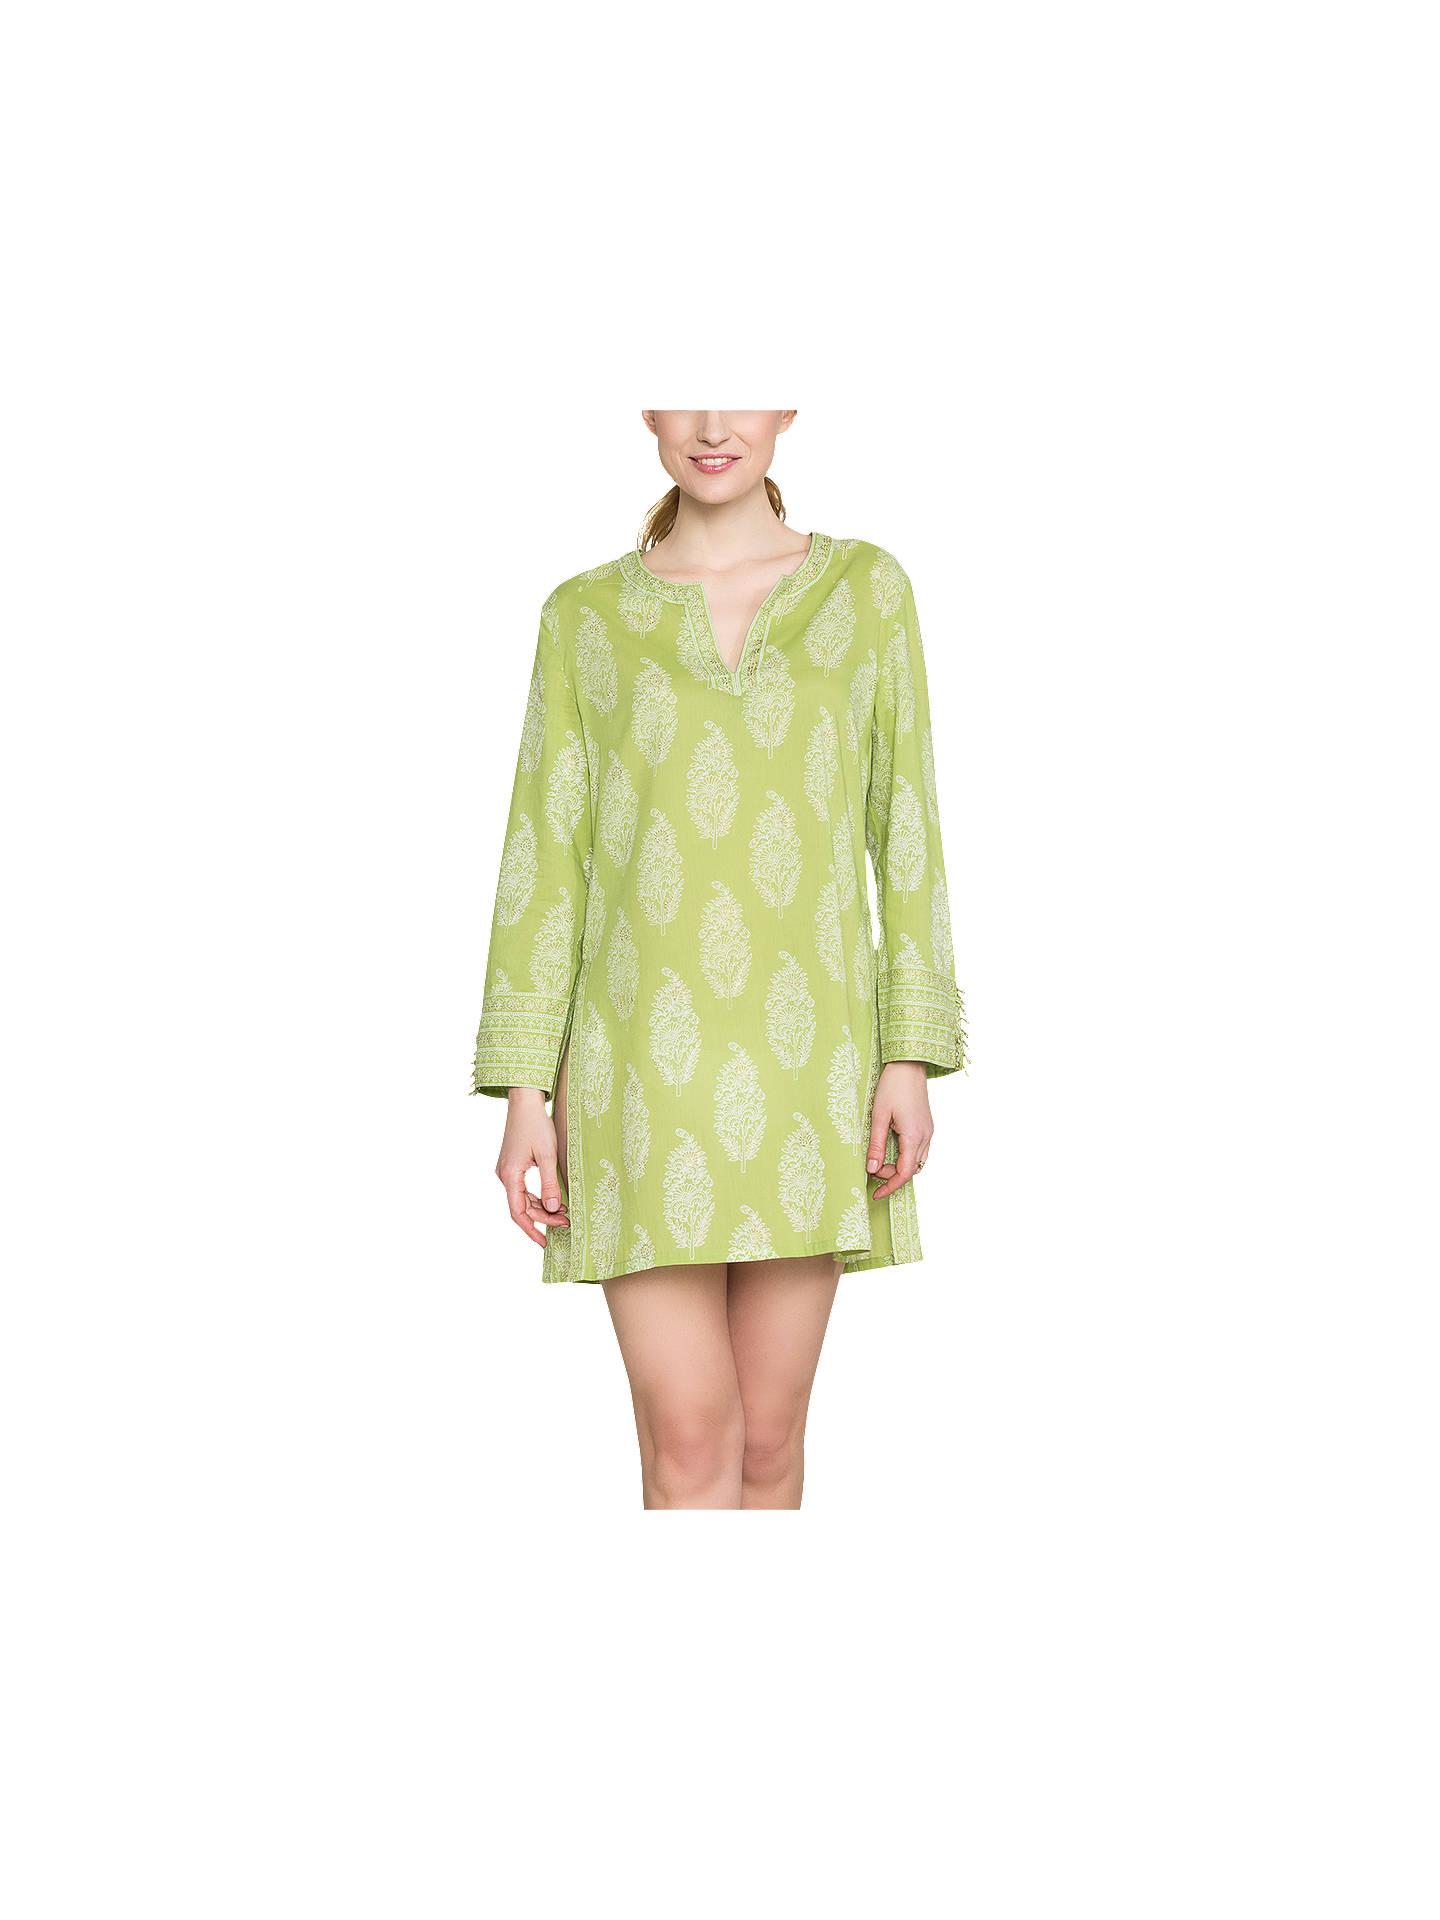 7d8d5d949ff View All Women's Shirts & Tops. Previous Image Next Image. Buy East Anokhi  Bamzai Kurta Tunic, Kiwi, 10 Online at johnlewis.com ...